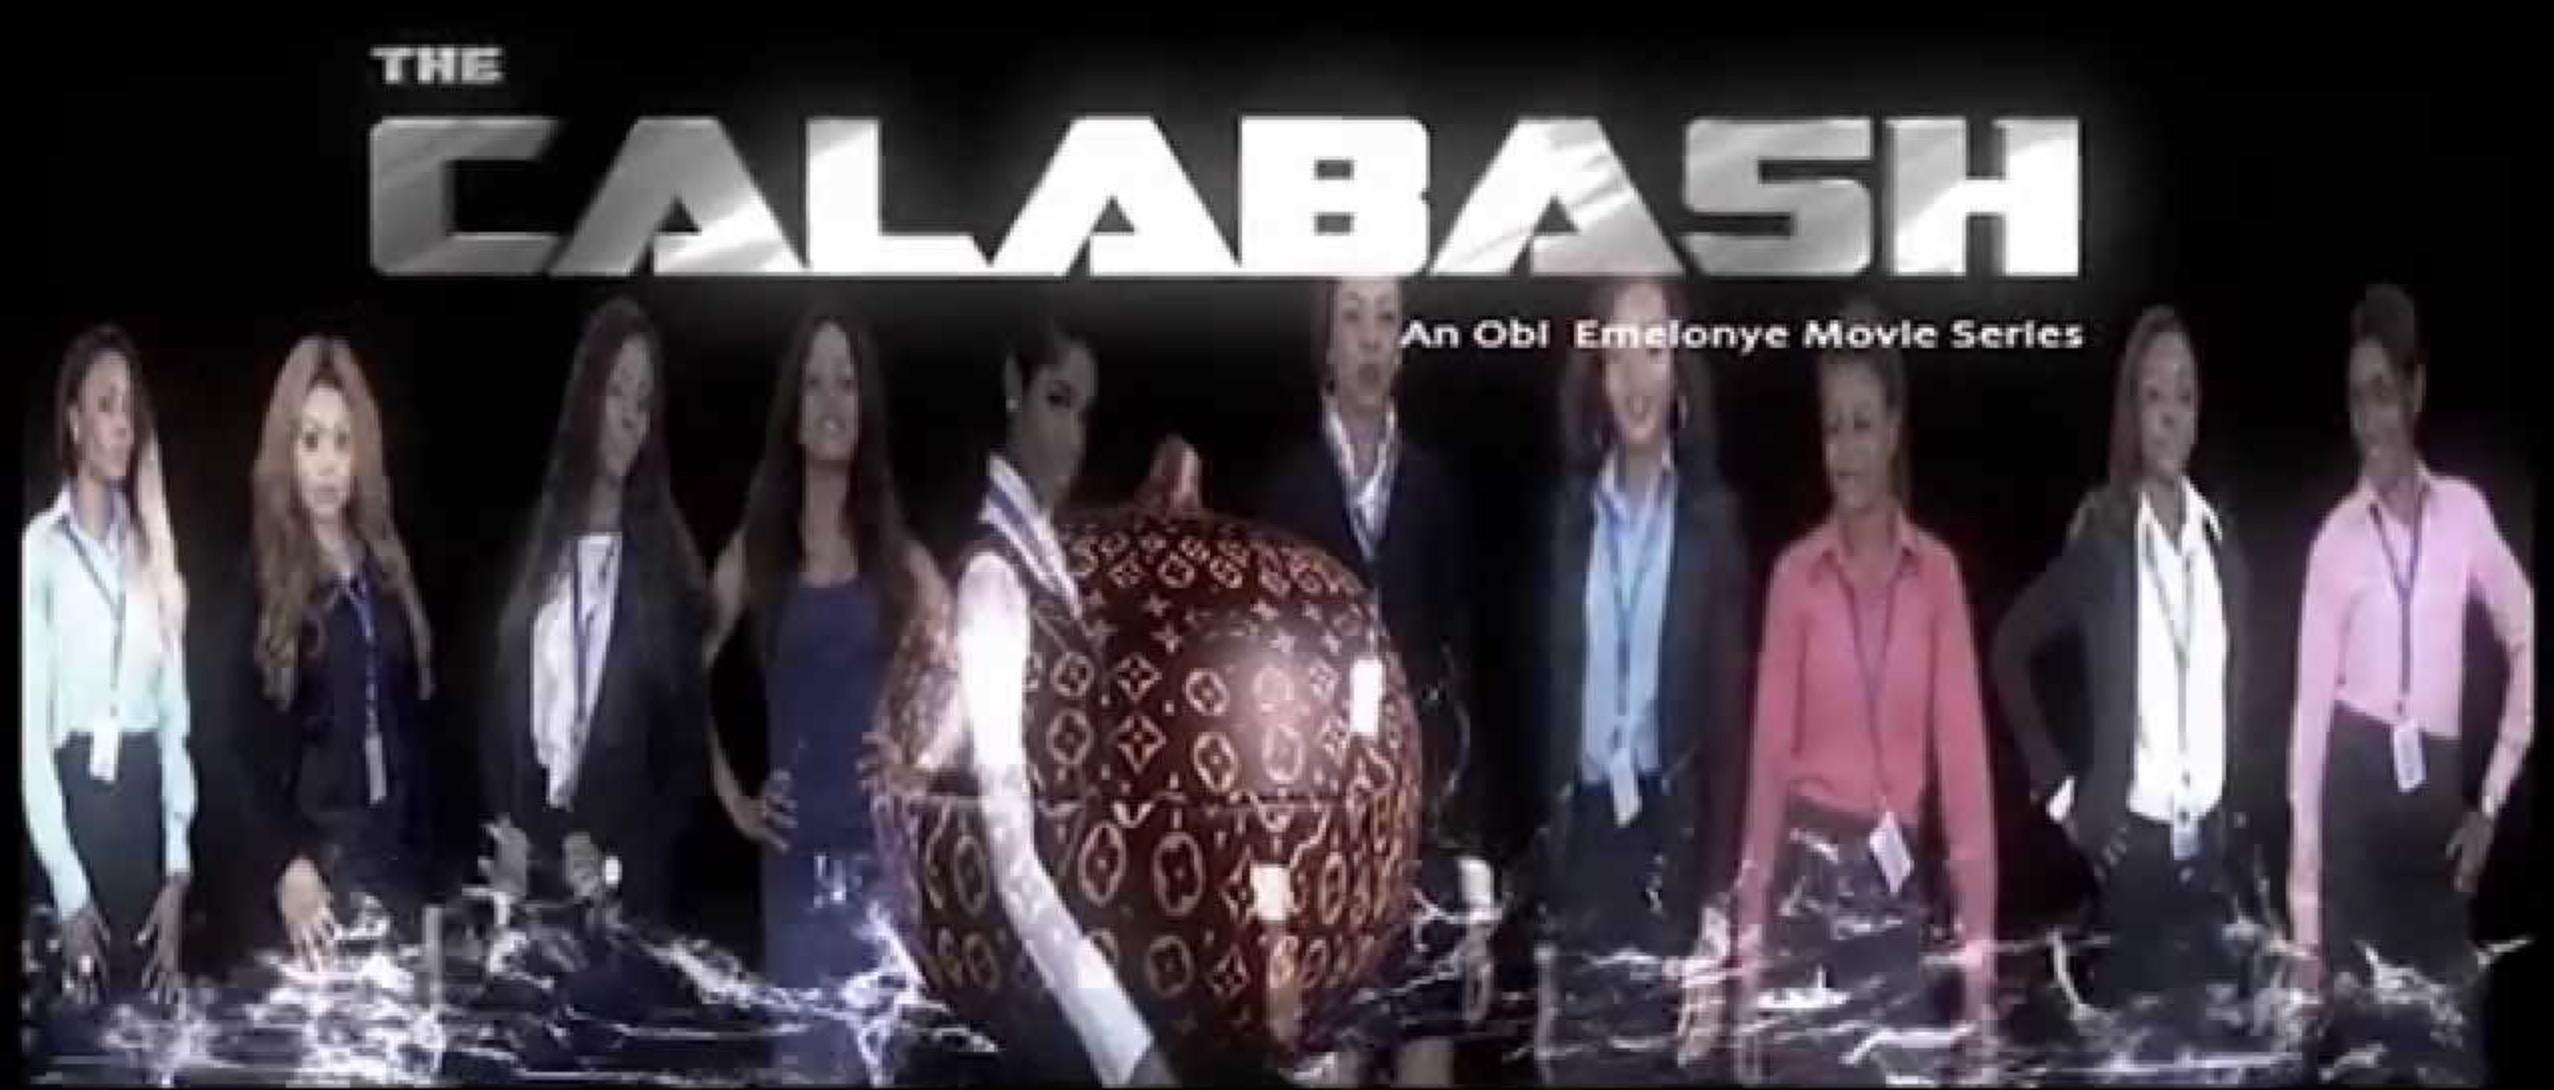 THE CALABASH